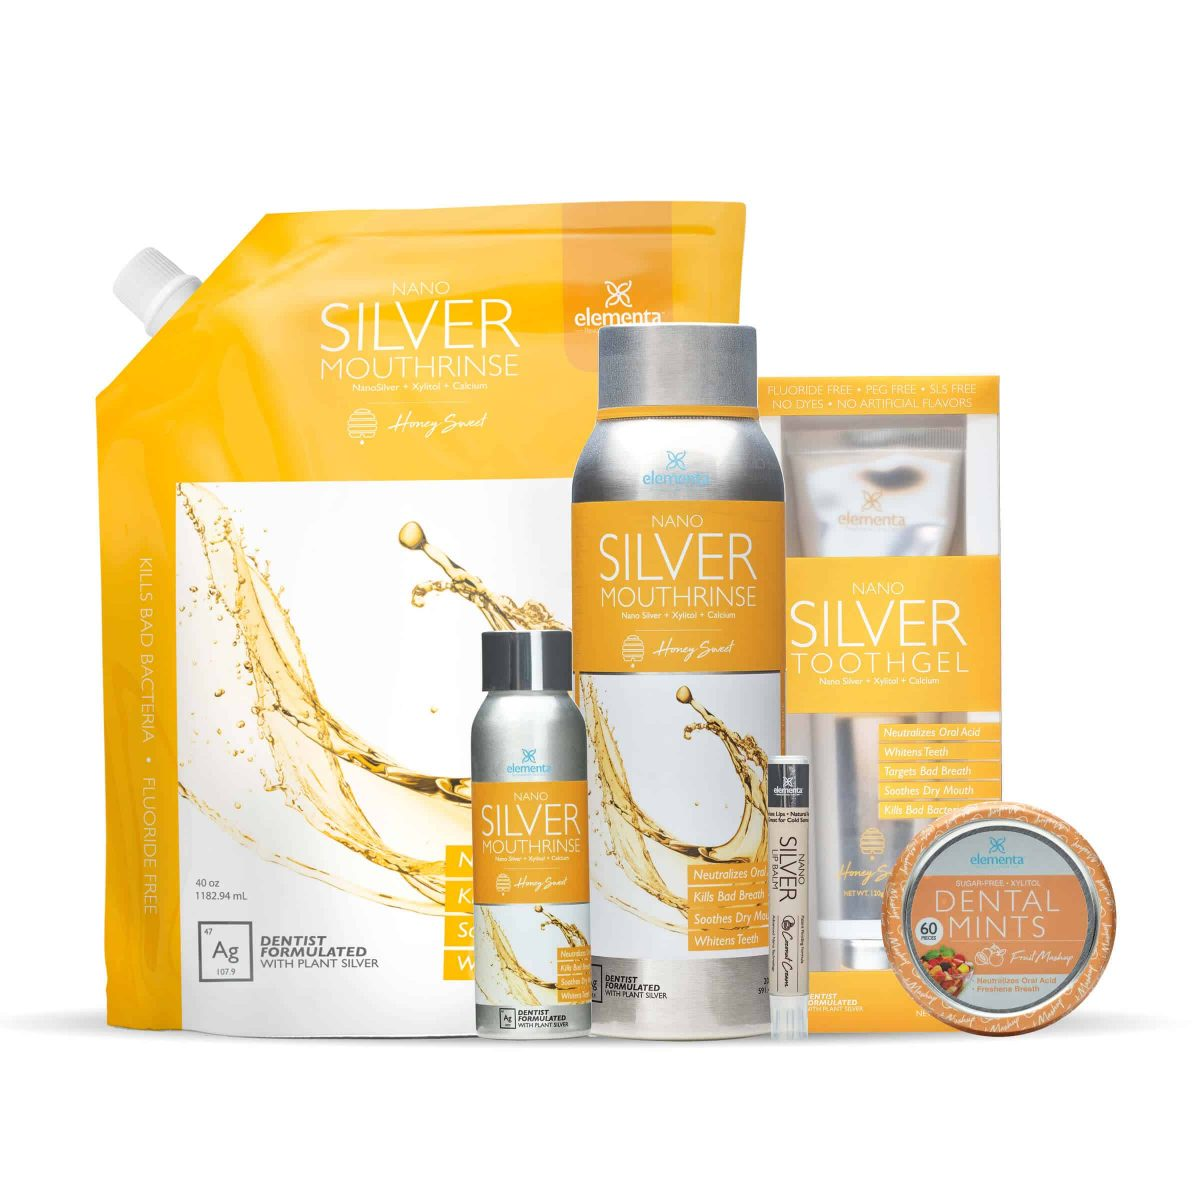 nano silver mouth rinse full routine honey sweet fruit mashup bundle